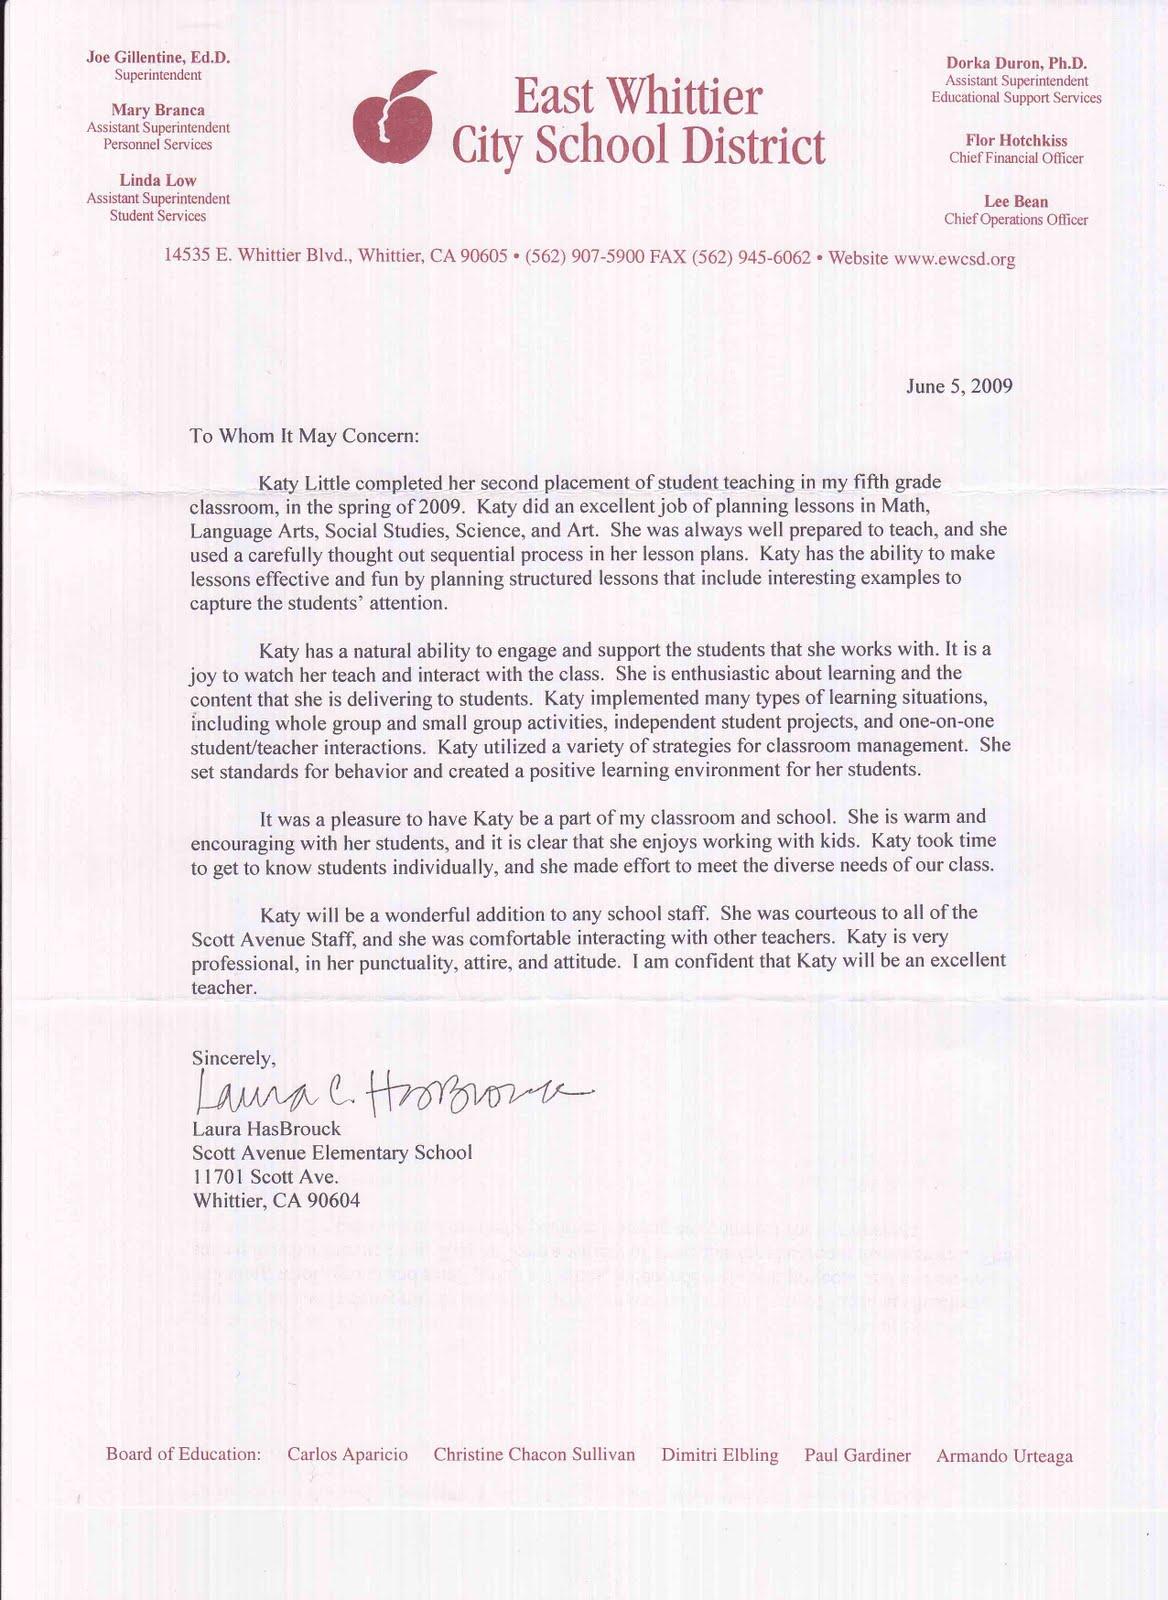 Recommendation Letter For Assistant Professor from 3.bp.blogspot.com